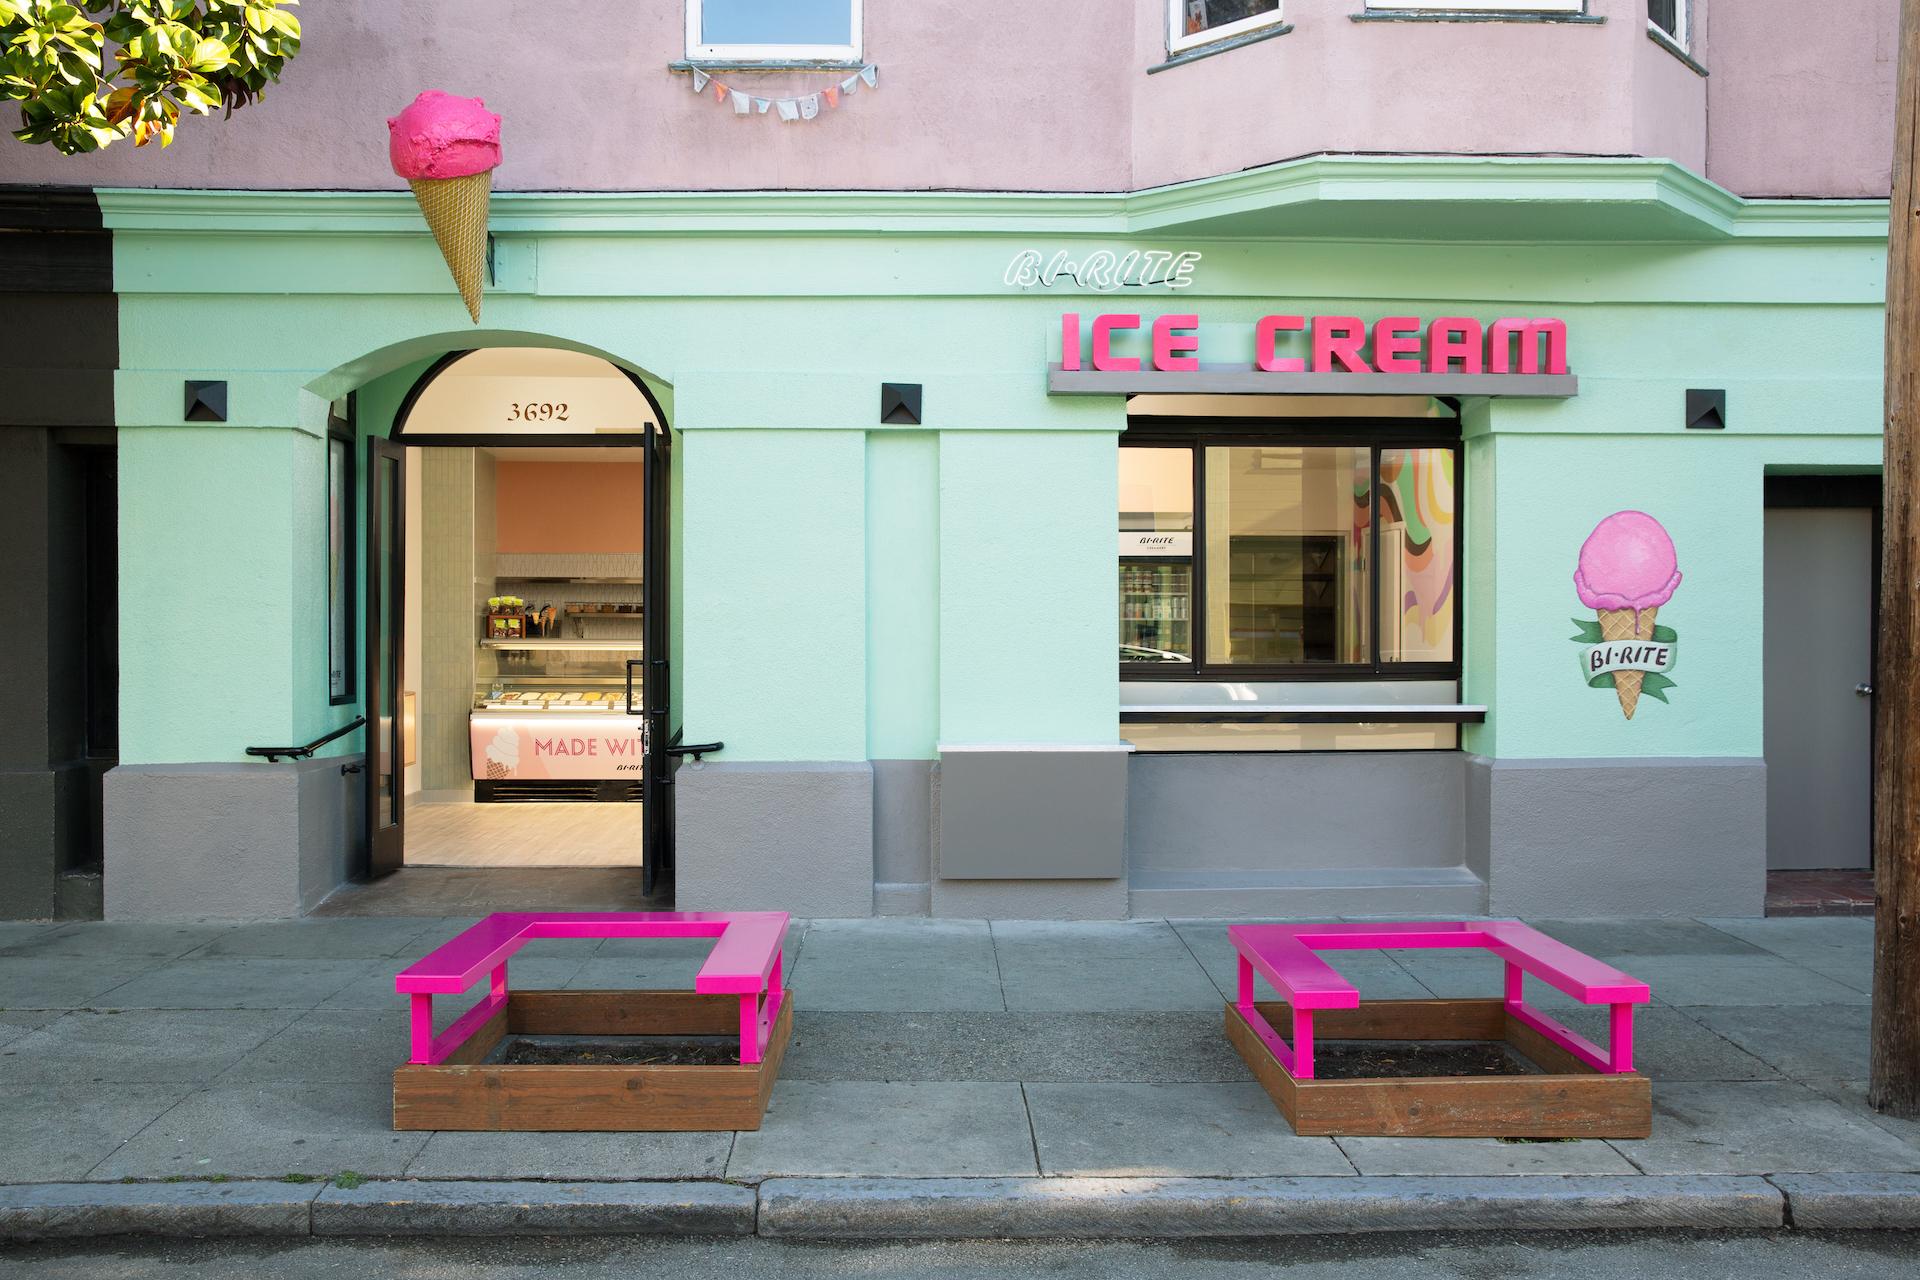 Bi-Rite Creamery's new exterior